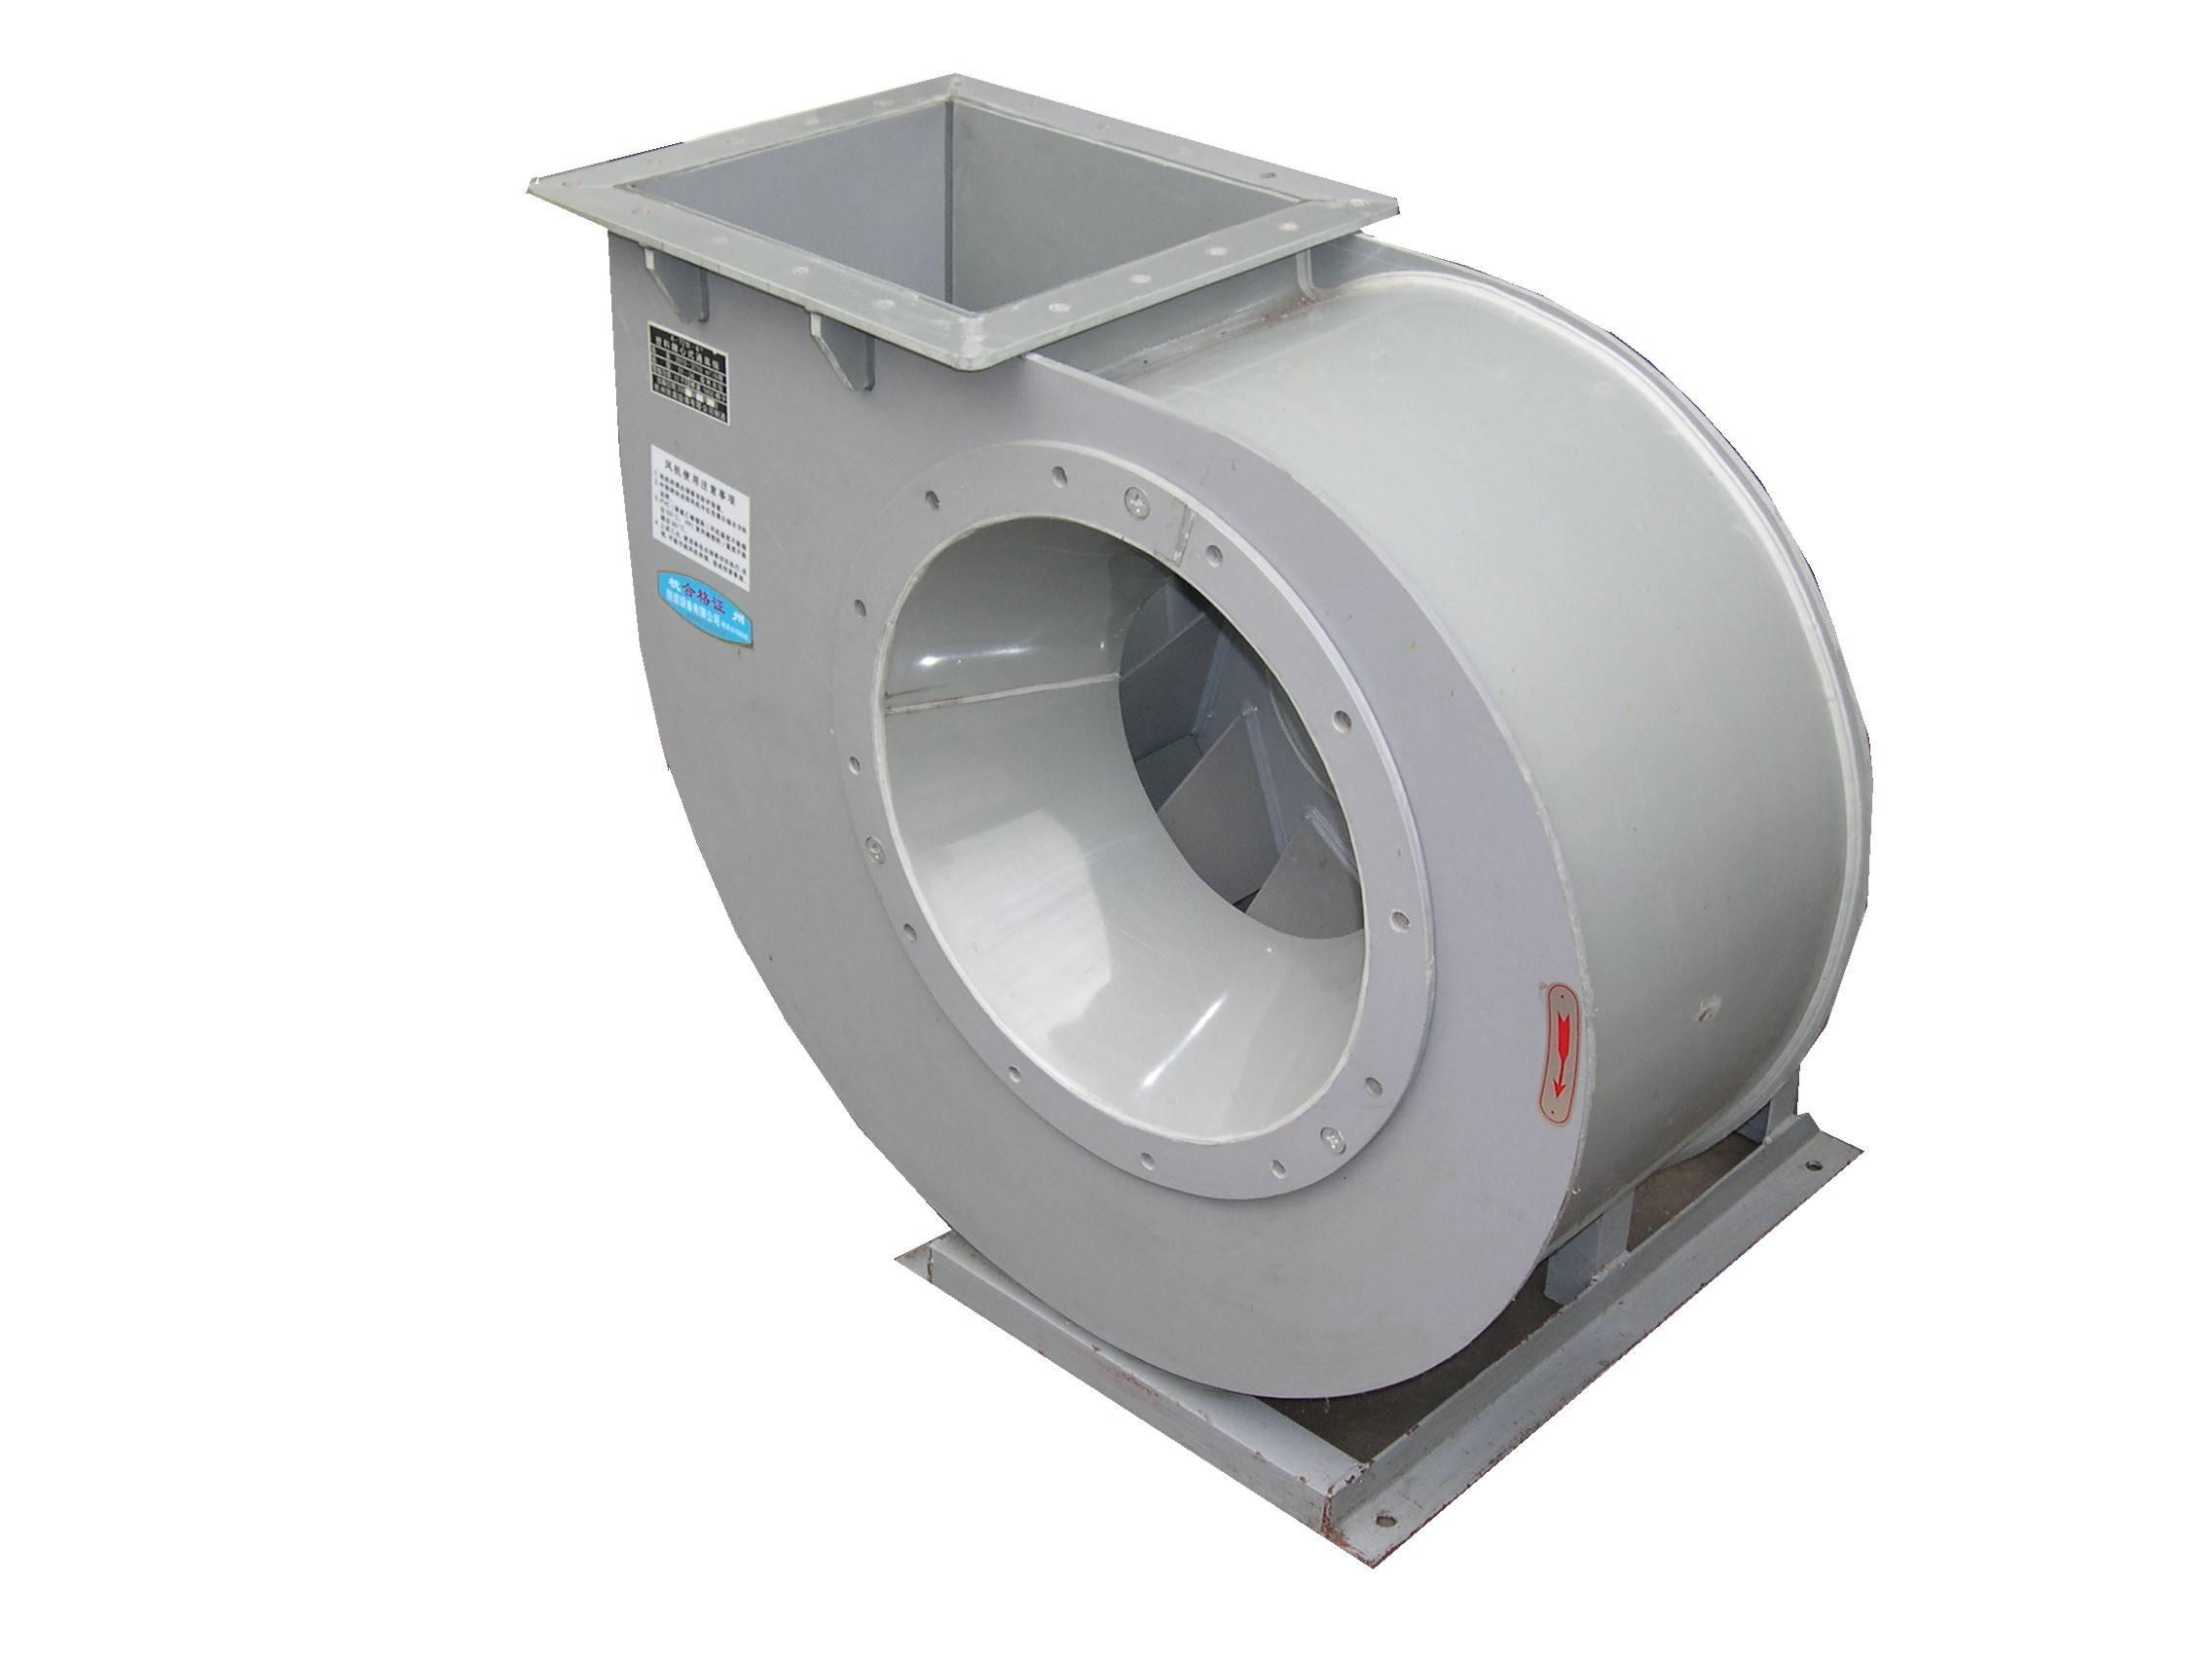 Centrifugal Fan 2 40 Watt : Pp centrifugal fan or blower hangzhou flying technology